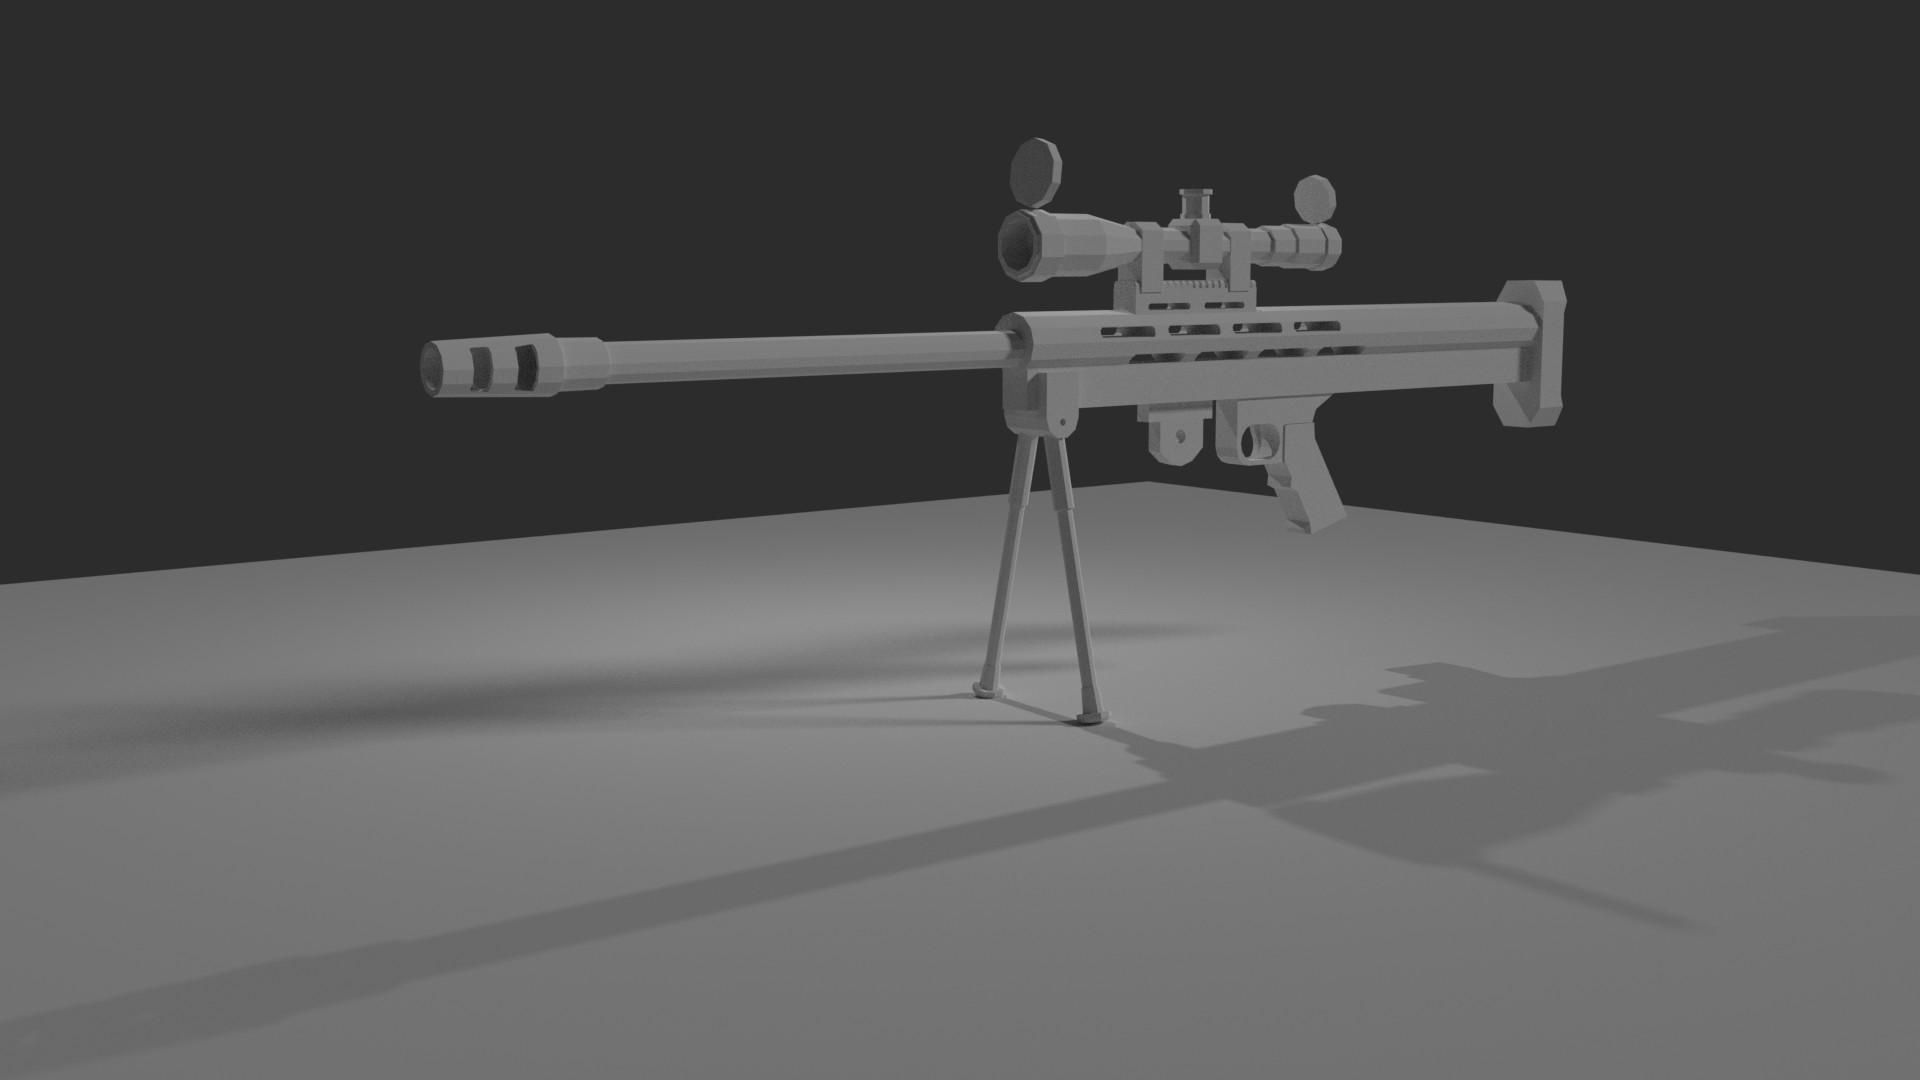 Artstation Lar Grizzly 50 Bmg Rifle Wip Debmalya Mitra